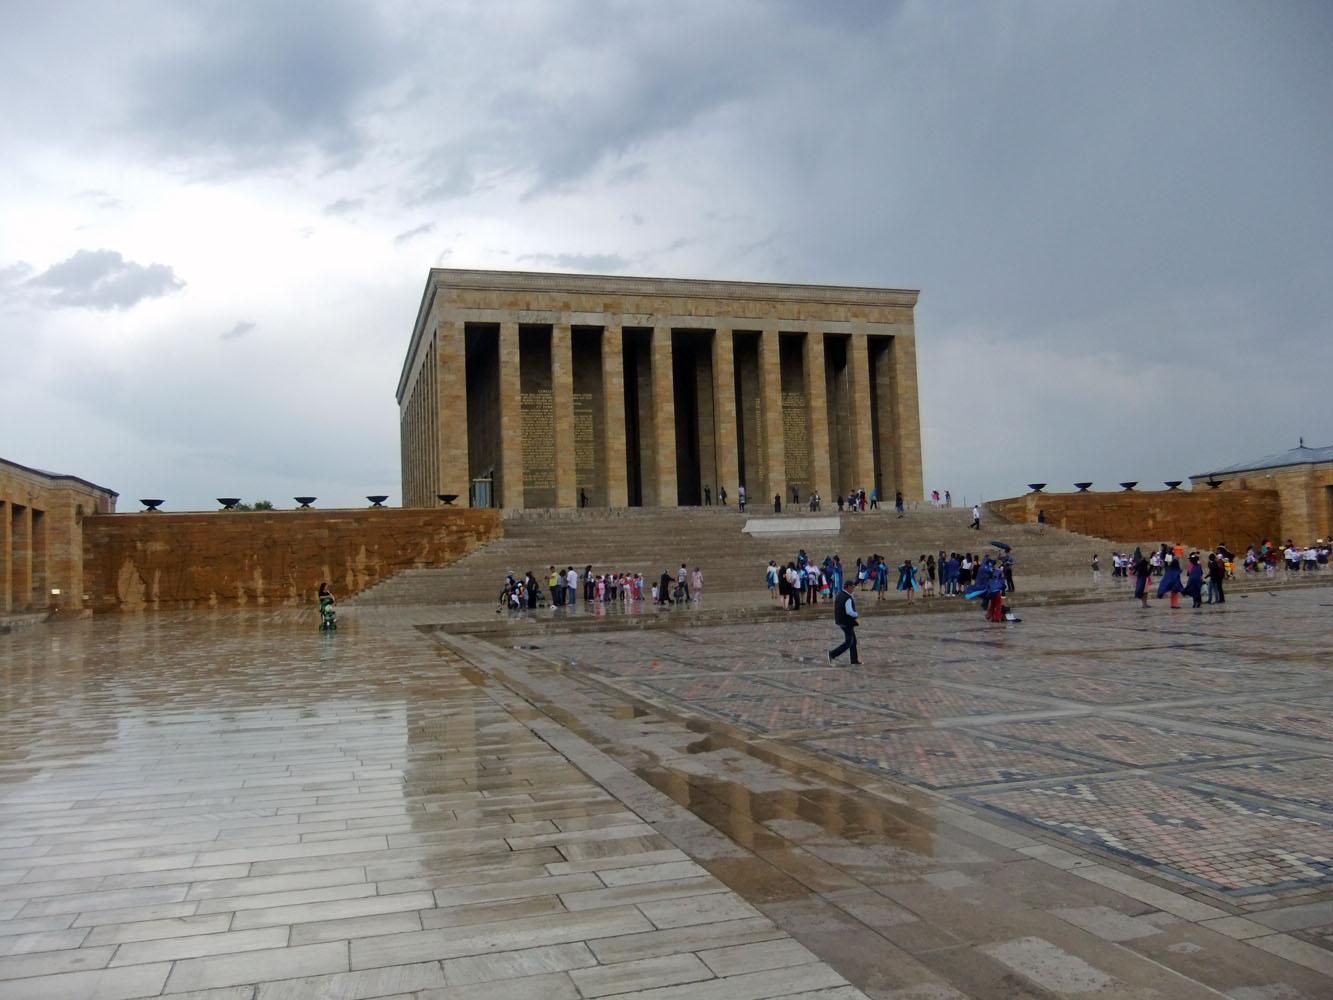 Atatürks Gedenkstätte